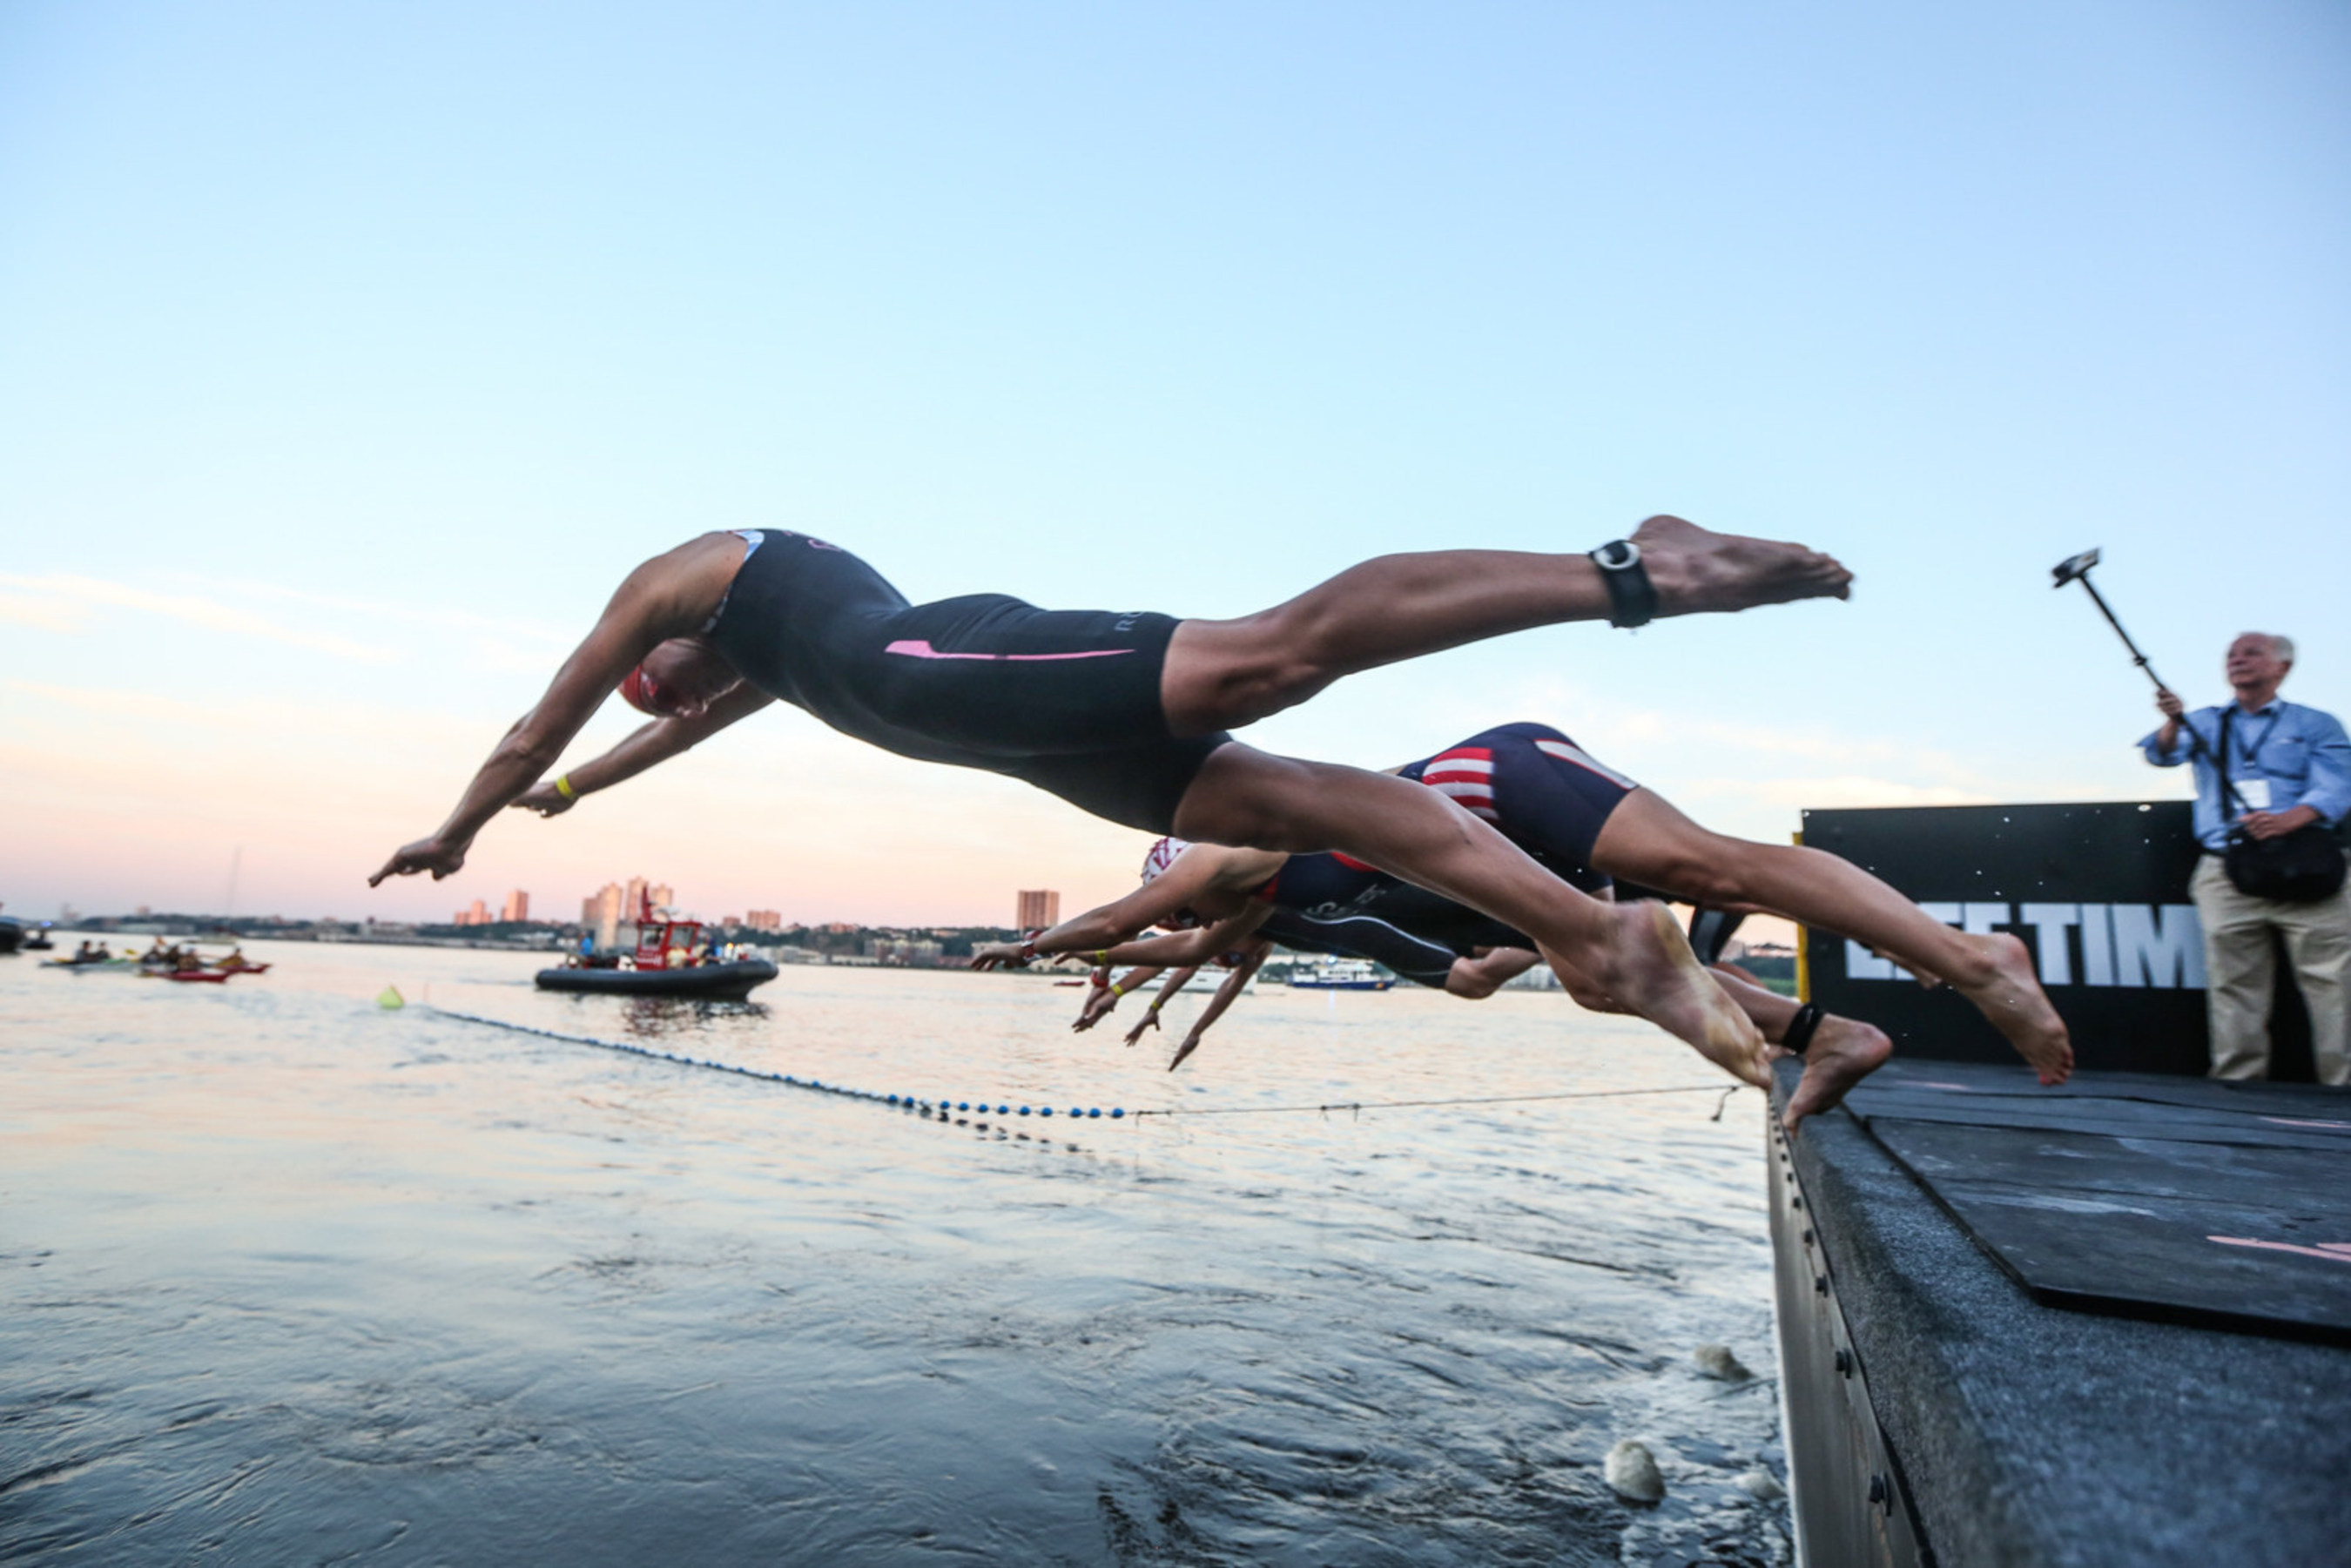 Photo Credit: Tom Olesnevich for the Panasonic NYC Triathlon.